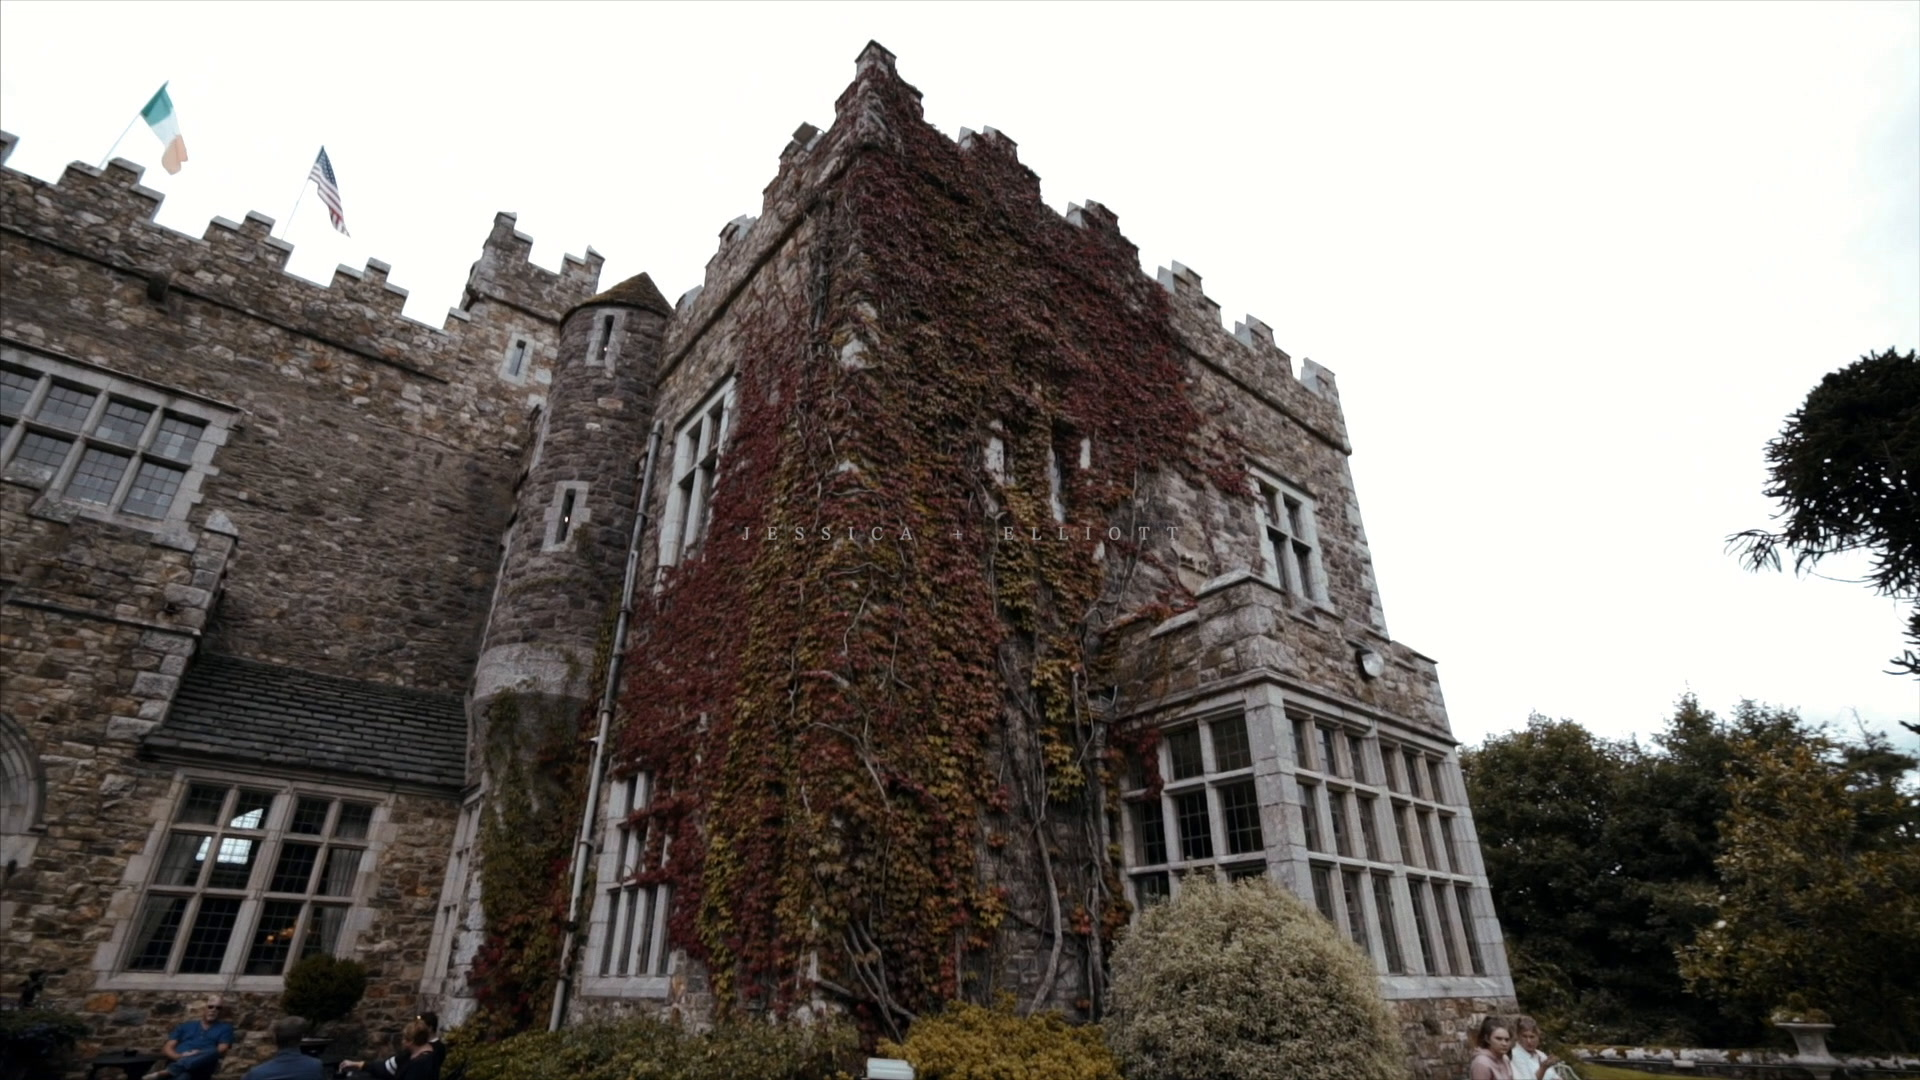 Jessica + Elliott | Waterford, Ireland | WWaterford Castle